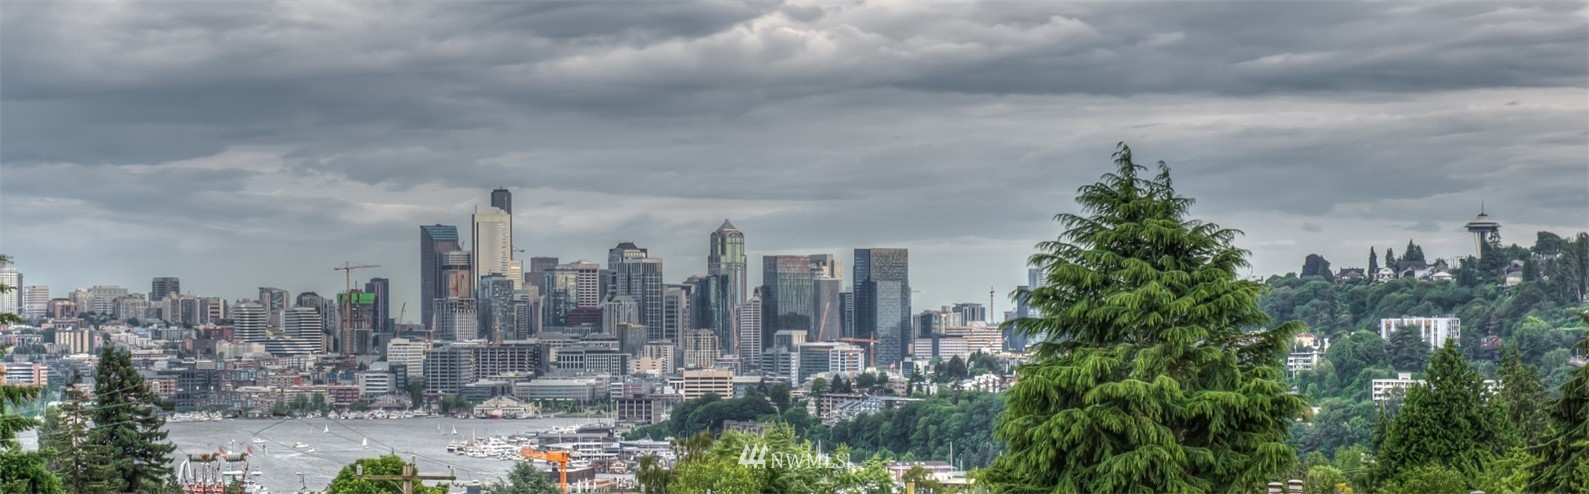 Sold Property | 4325 Woodland Park Avenue N Seattle, WA 98103 12